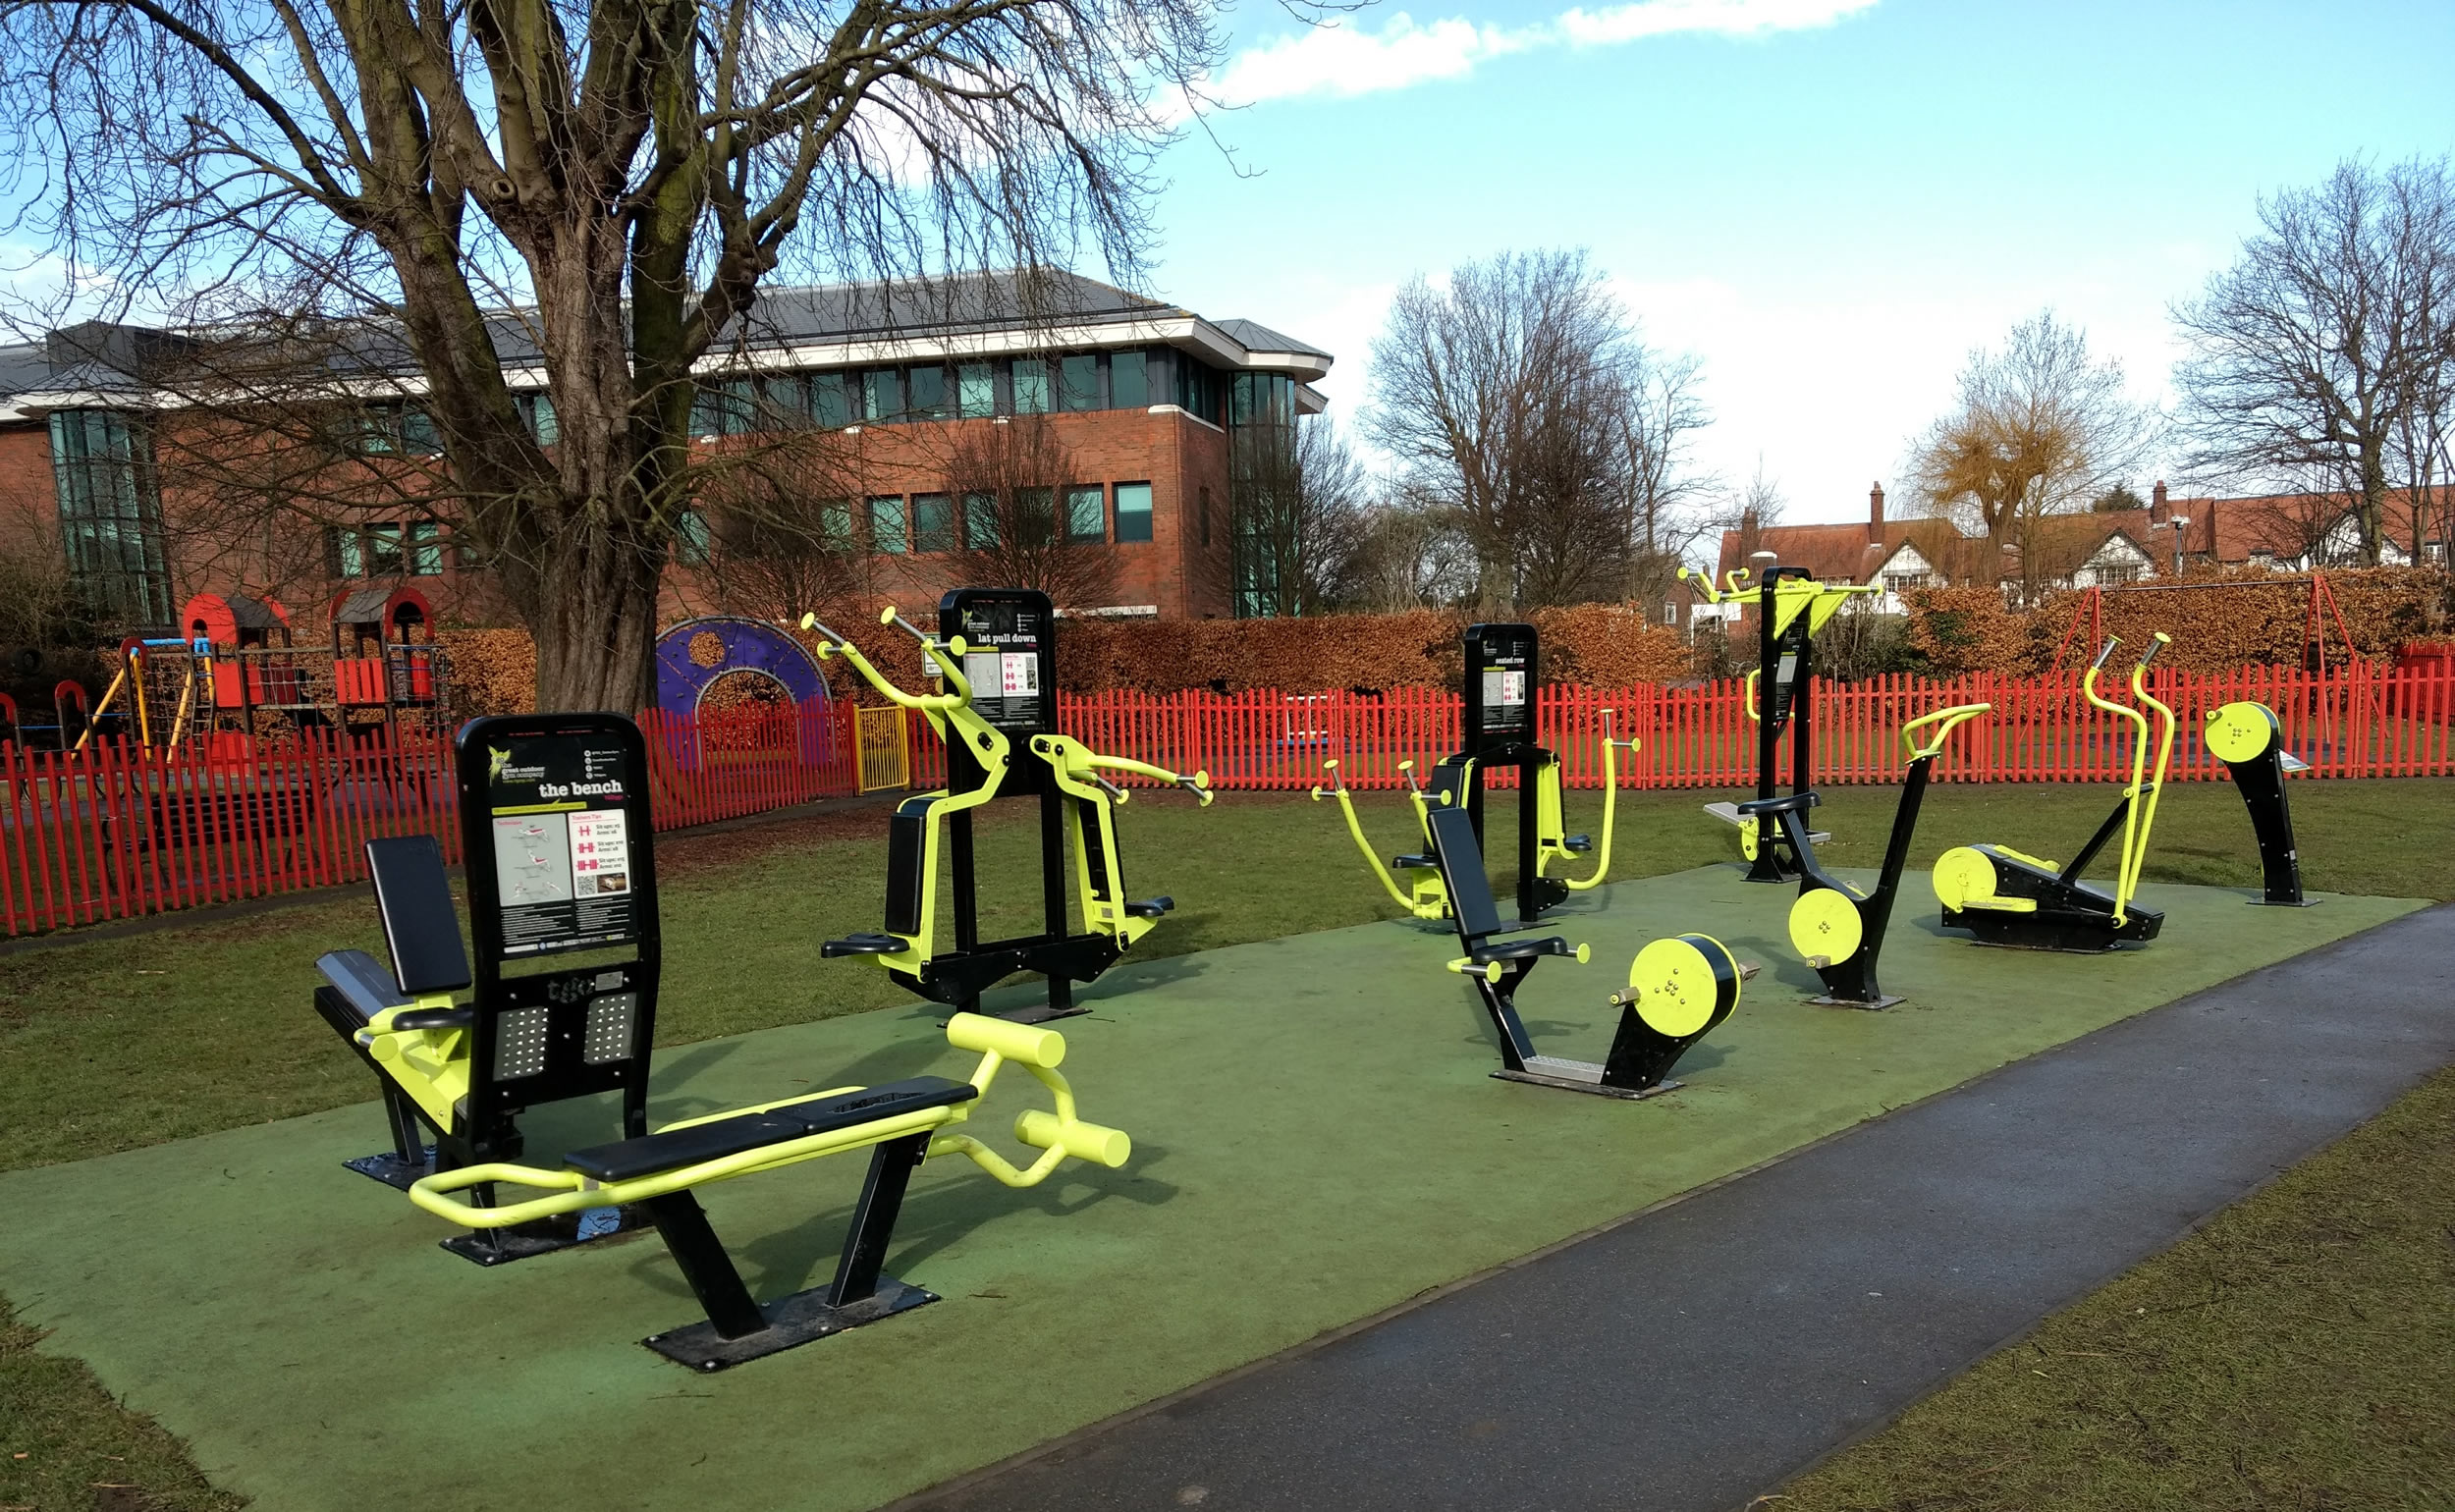 Outdoor Gym at Cobham Recreation Ground - Provided by Elmbridge Borough Council